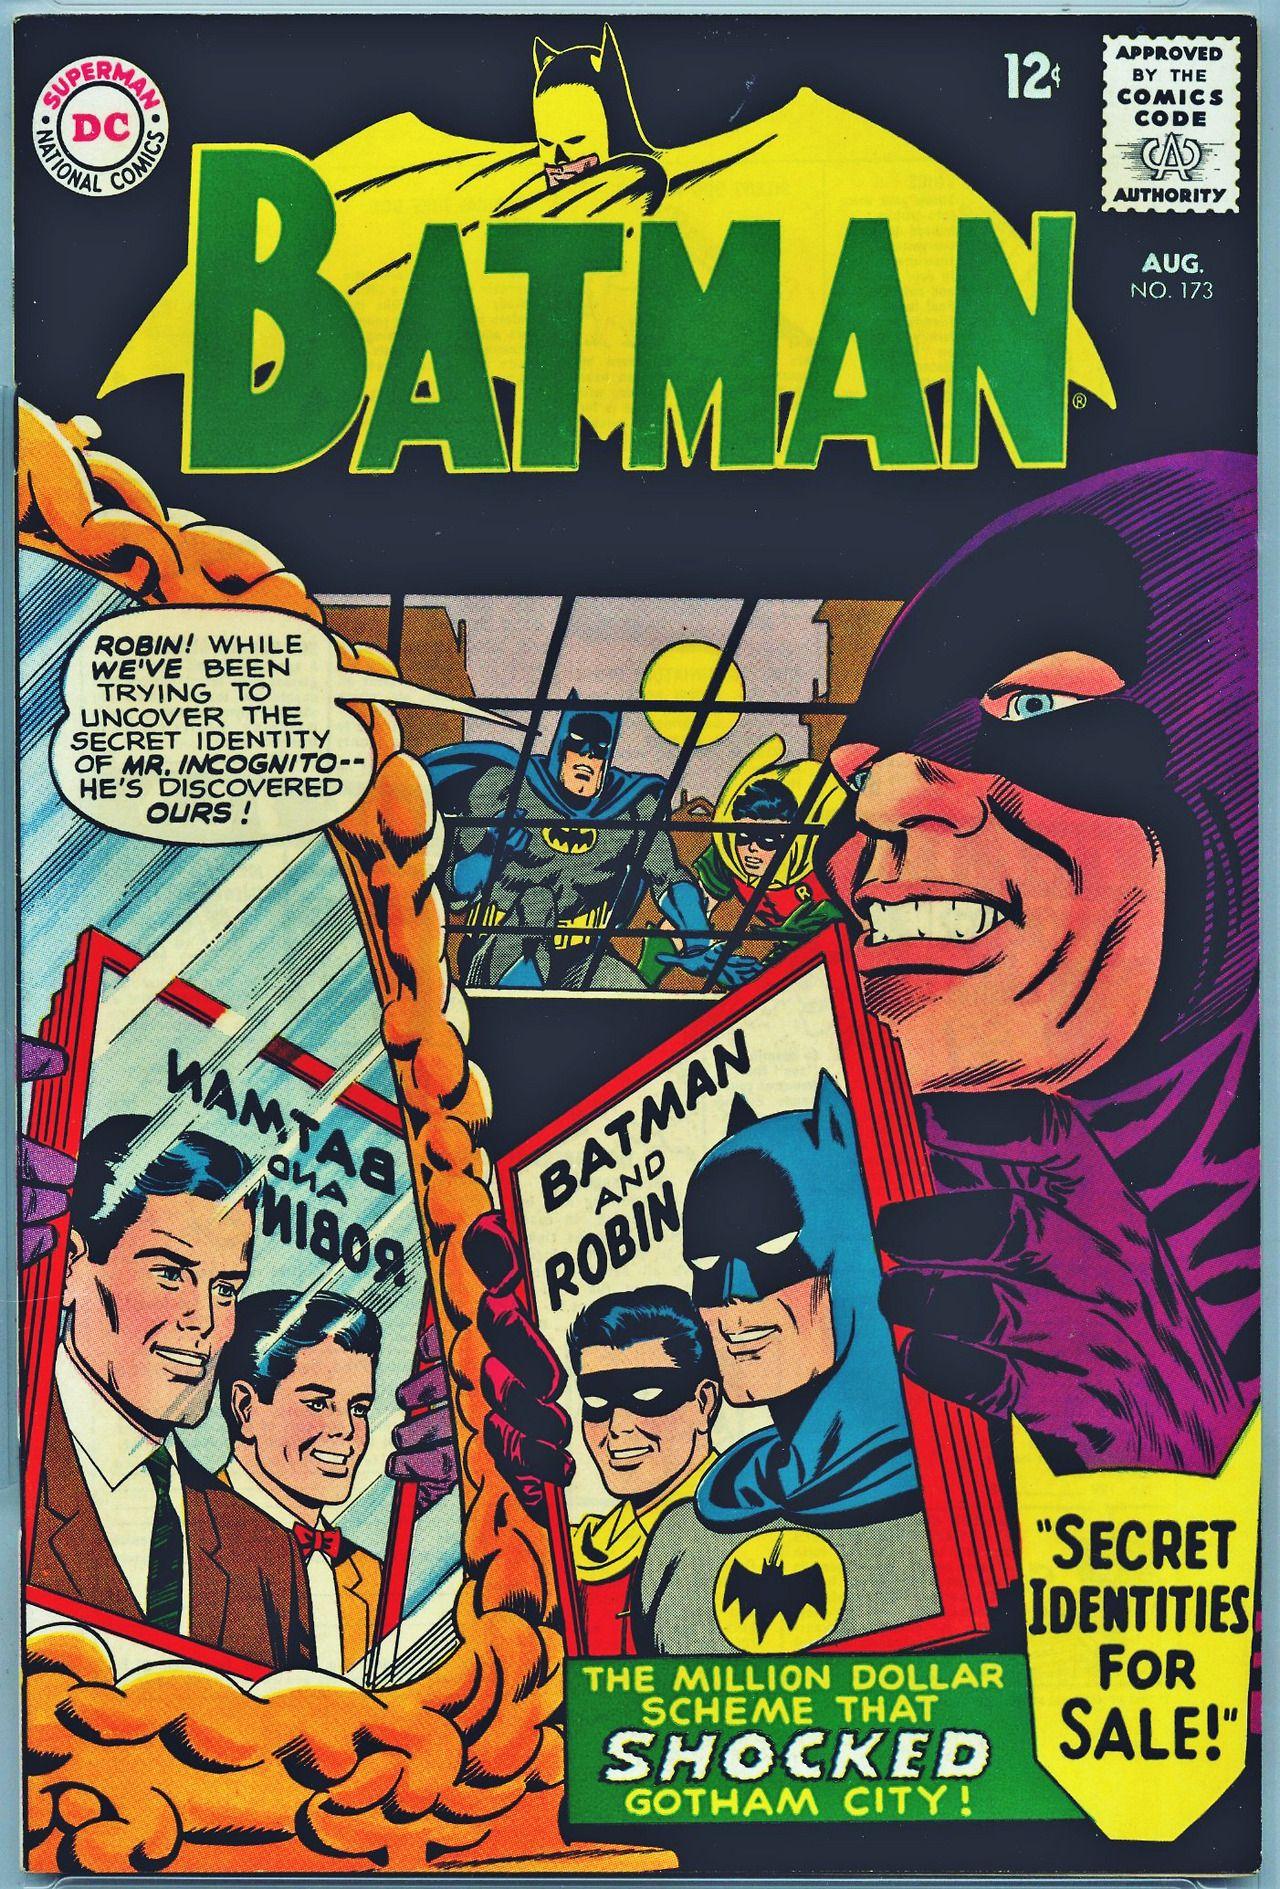 Batman 173 cover tumblr_nhpsrbQRAW1rn55nzo1_1280.jpg (1280×1889)